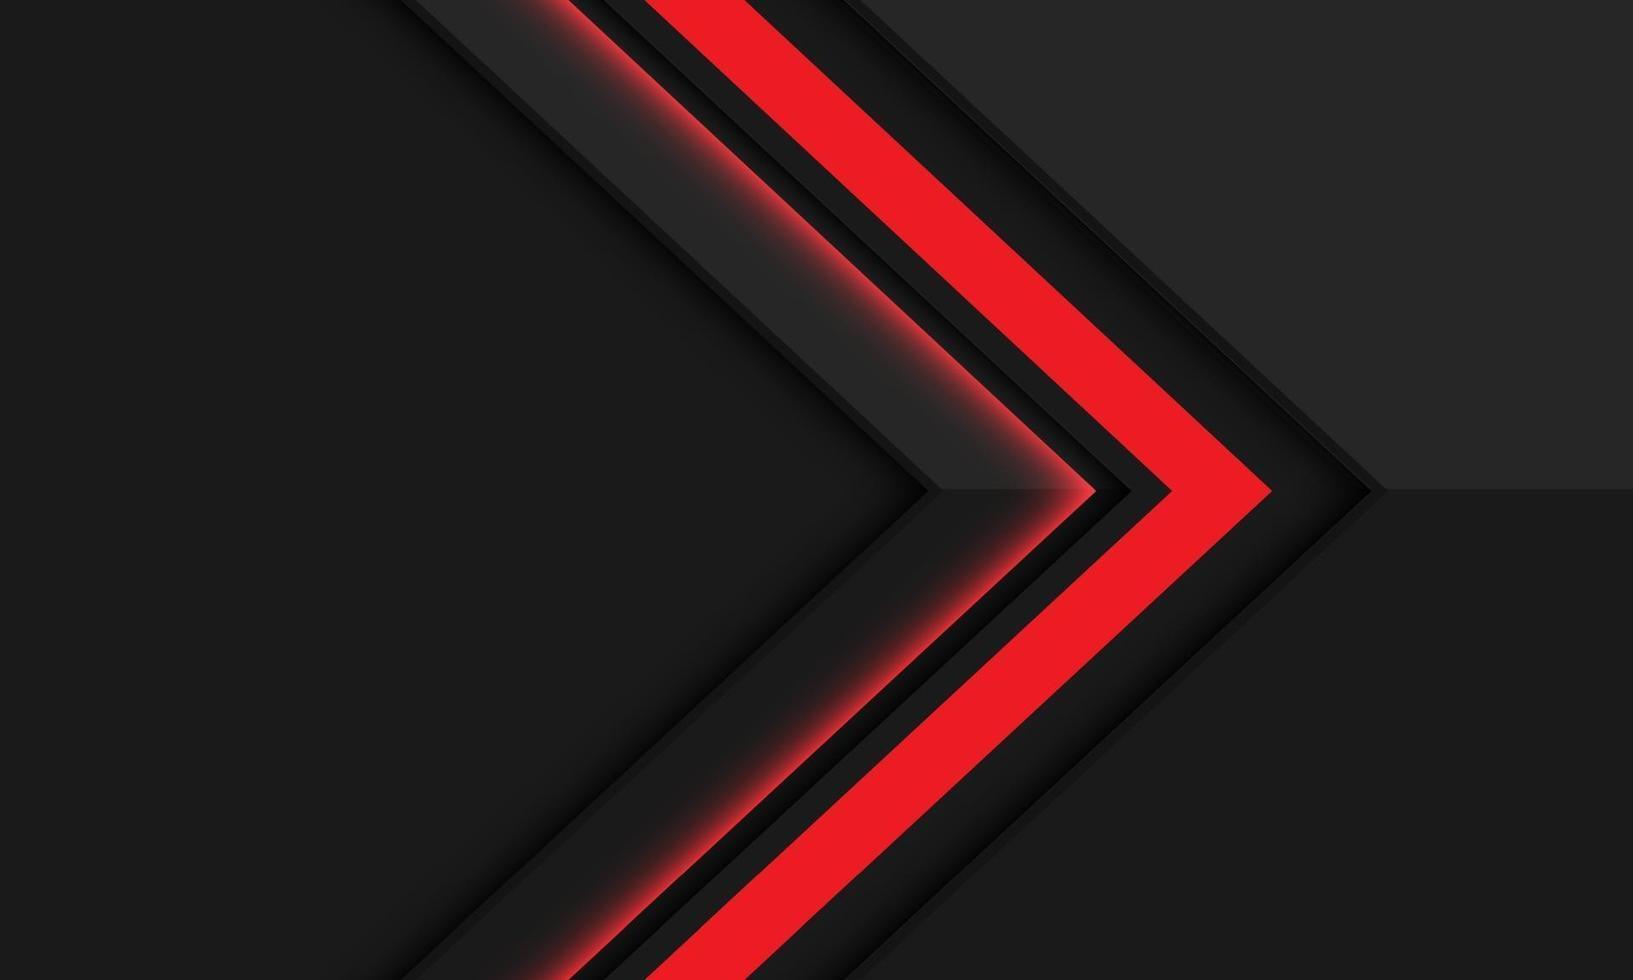 abstrakt röd pilskuggriktning på mörkgrå metallisk med tomrumsdesign modern futuristisk bakgrundsvektorillustration. vektor